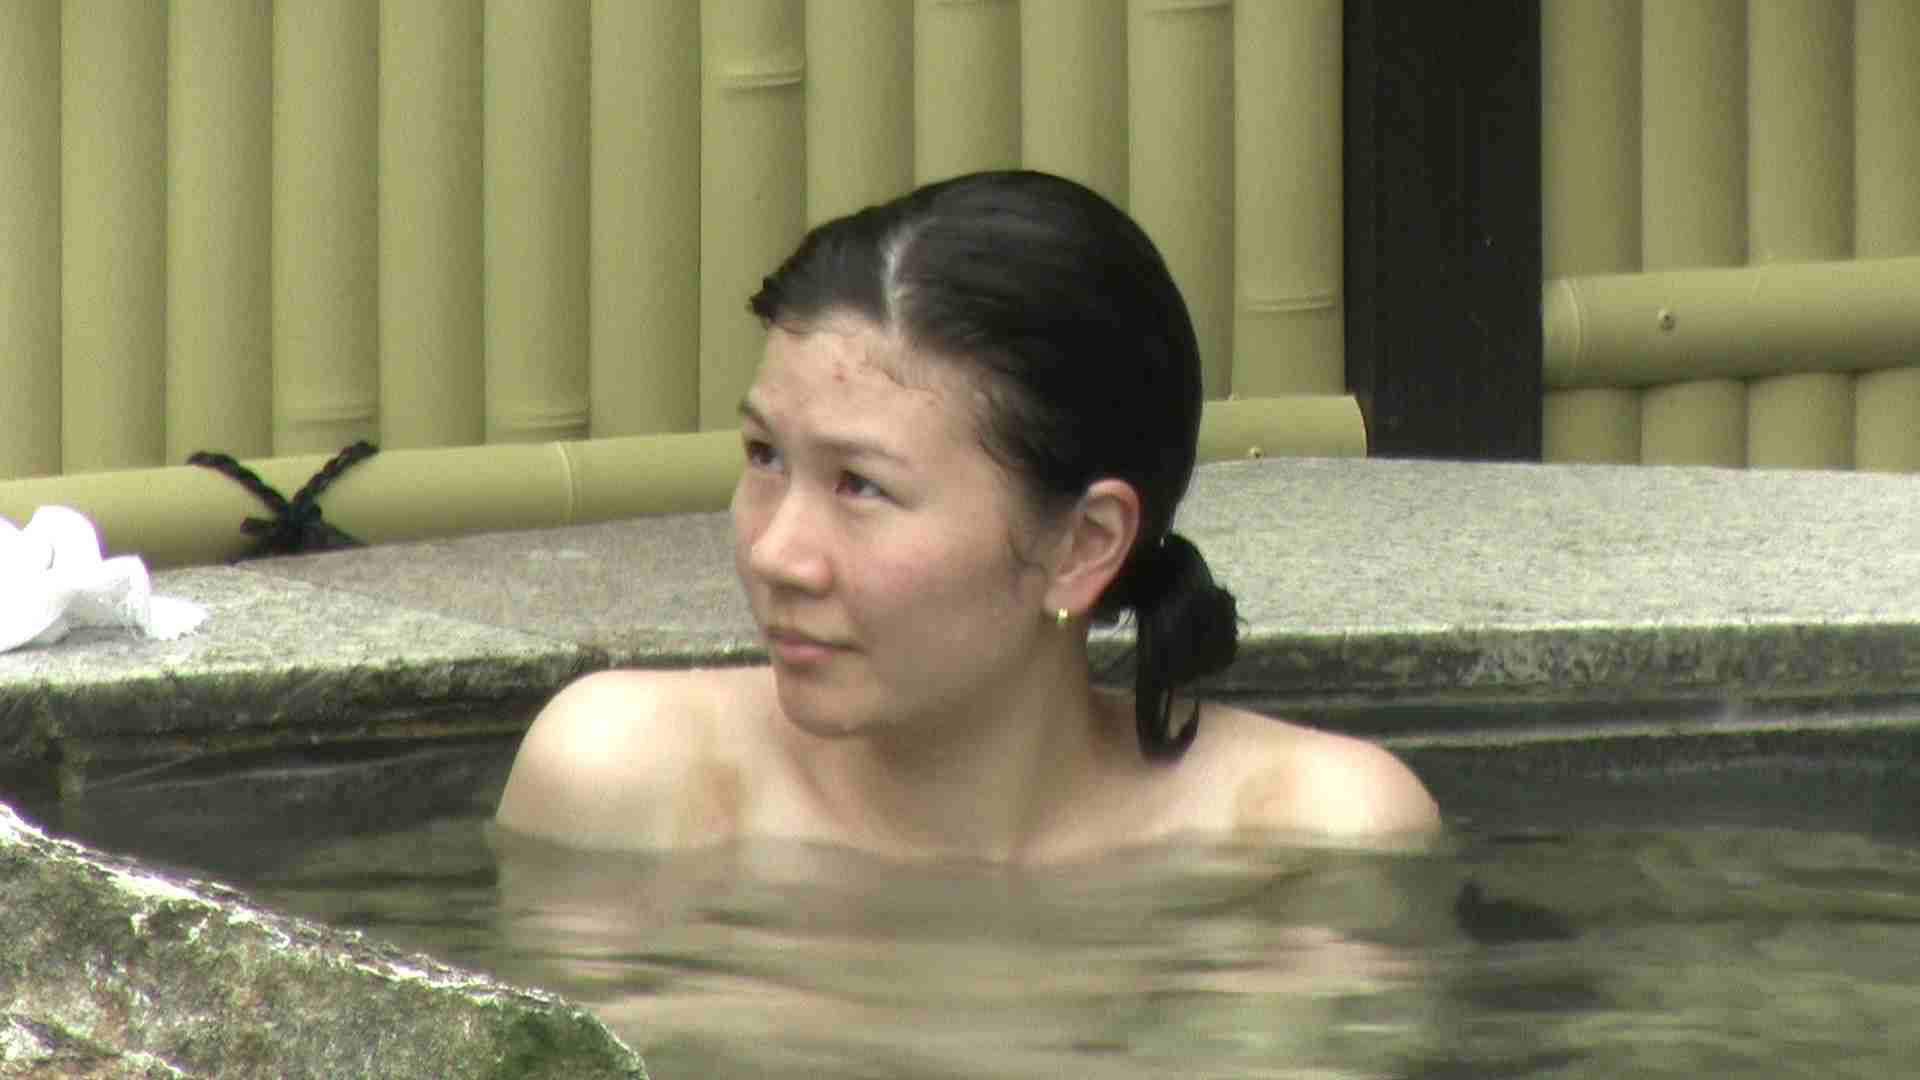 Aquaな露天風呂Vol.187 盗撮映像  99Pix 29